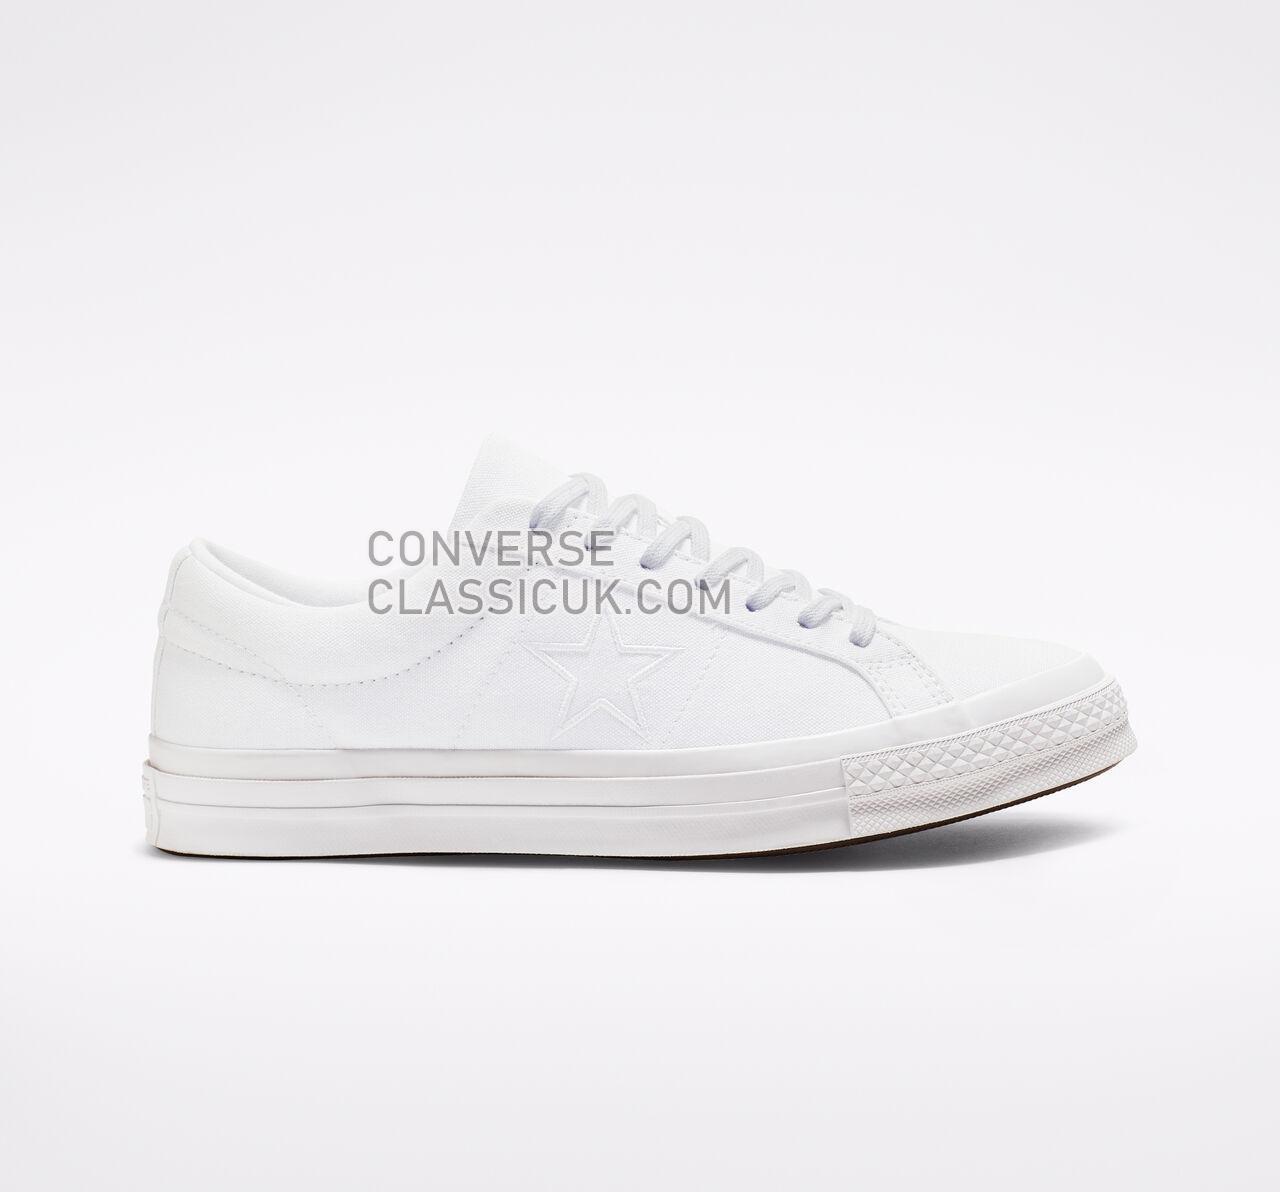 Converse One Star Seasonal Color Mens Womens Unisex 163377C White/White/White Shoes